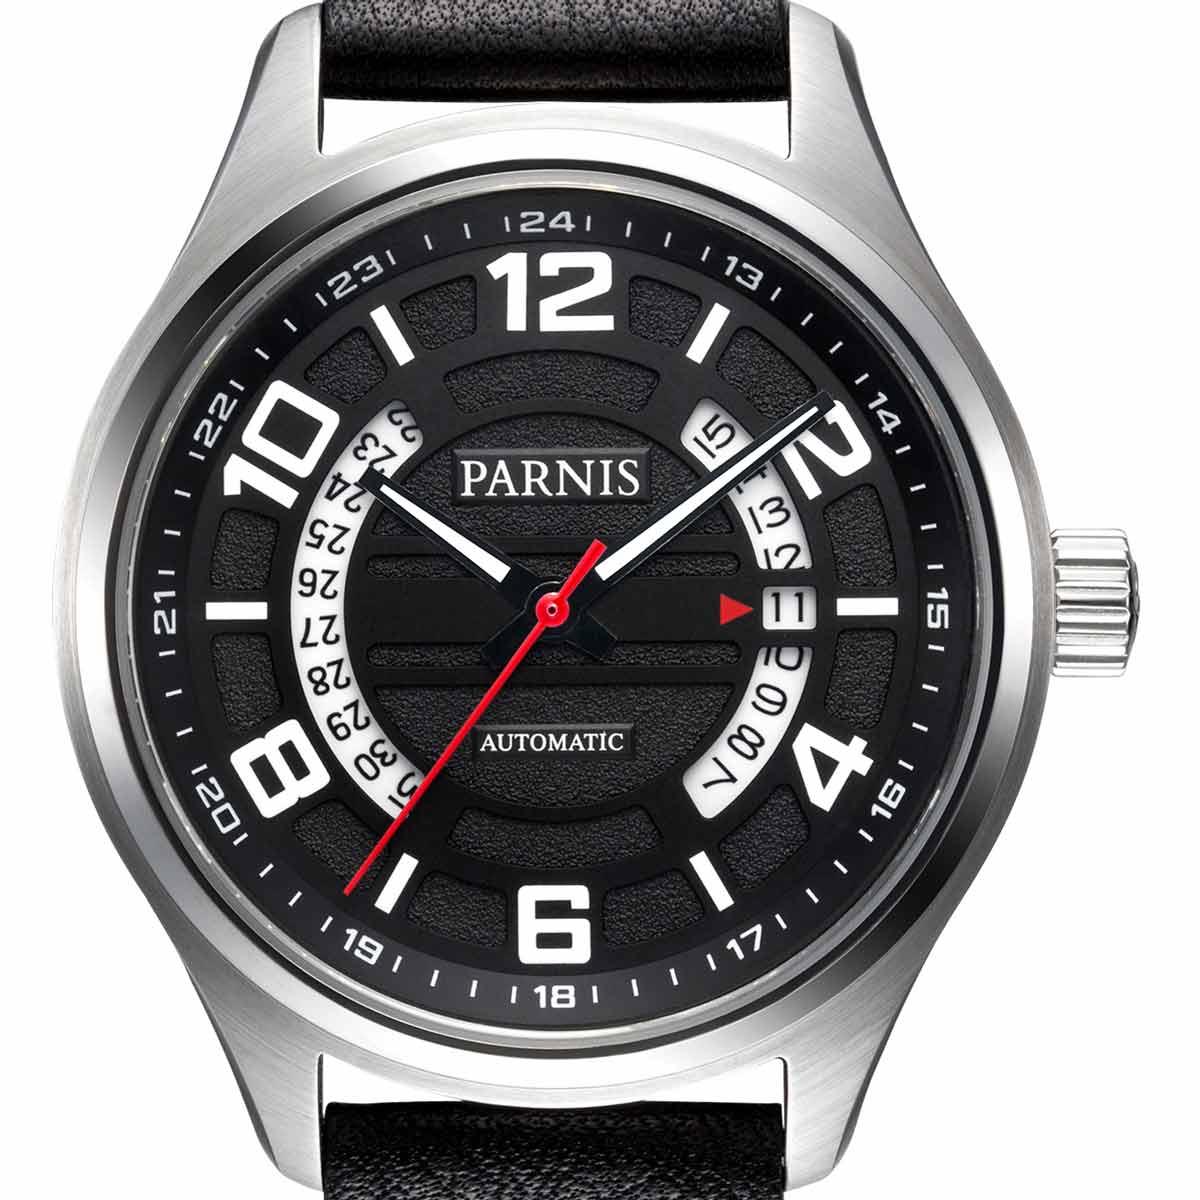 【NEW】PARNIS パーニス 自動巻き 腕時計 [PA6052-S3AL-SVBK] 並行輸入品 純正ケース メーカー保証12ヶ月